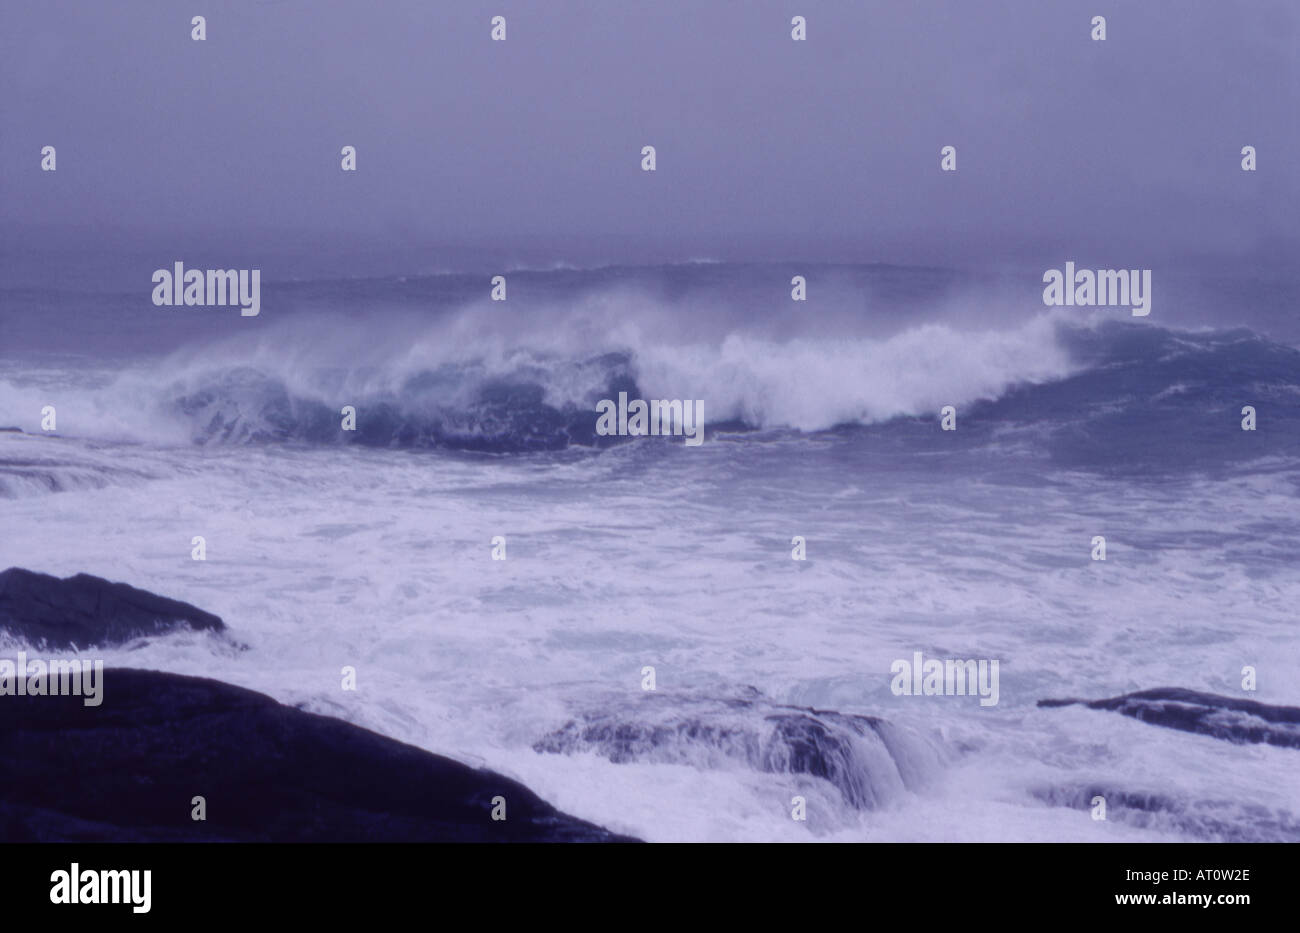 Stormy sea in Hebrides Scotland - Stock Image